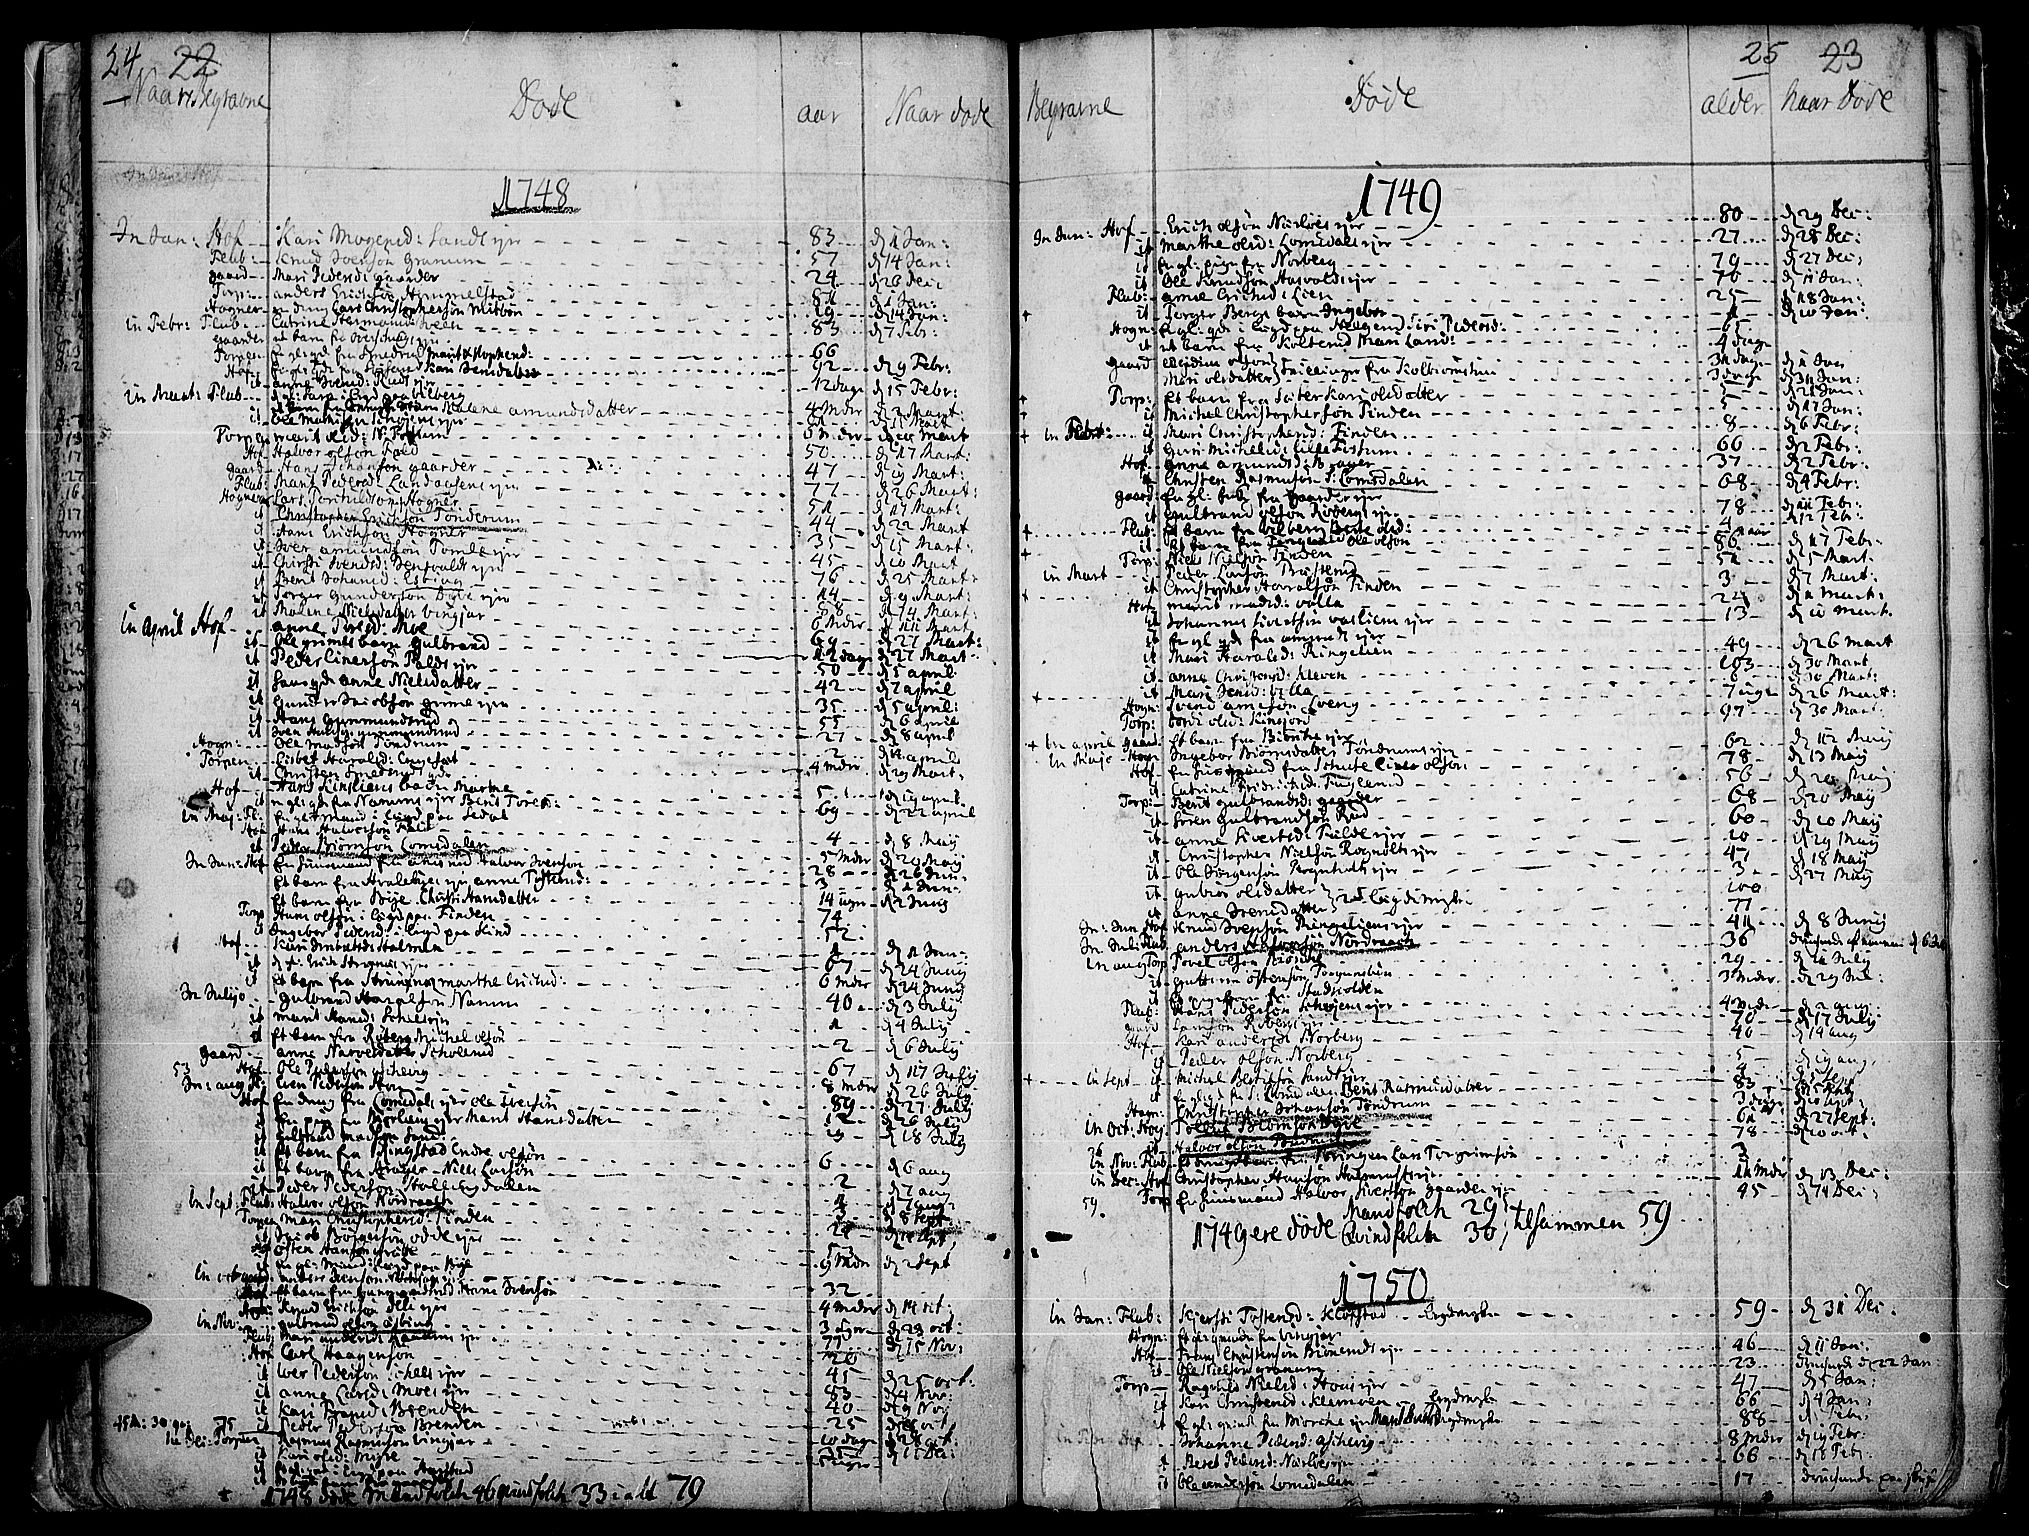 SAH, Land prestekontor, Ministerialbok nr. 4, 1733-1764, s. 24-25